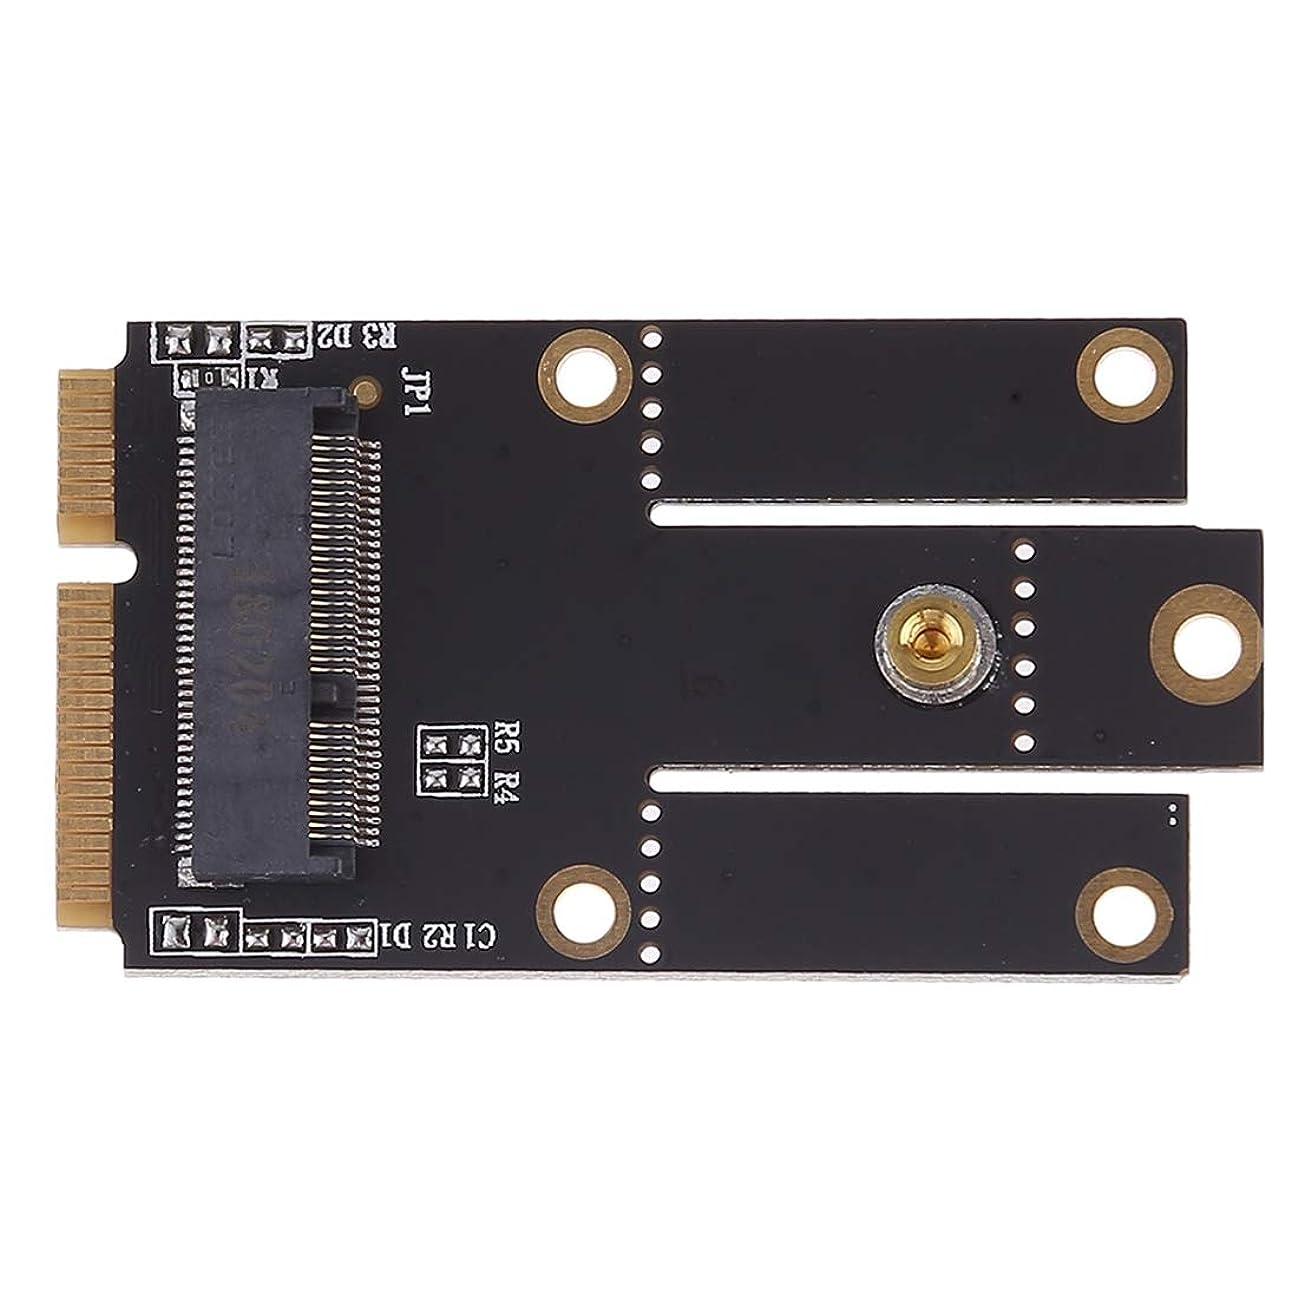 WTYDコンピューターアクセサリー Intel 9260 8265 7260 AC NGFF Wifi Bluetoothワイヤレスカード用ミニPCI-E PCI Express変換アダプタへのM.2 NGFFキーA コンピューターに使用